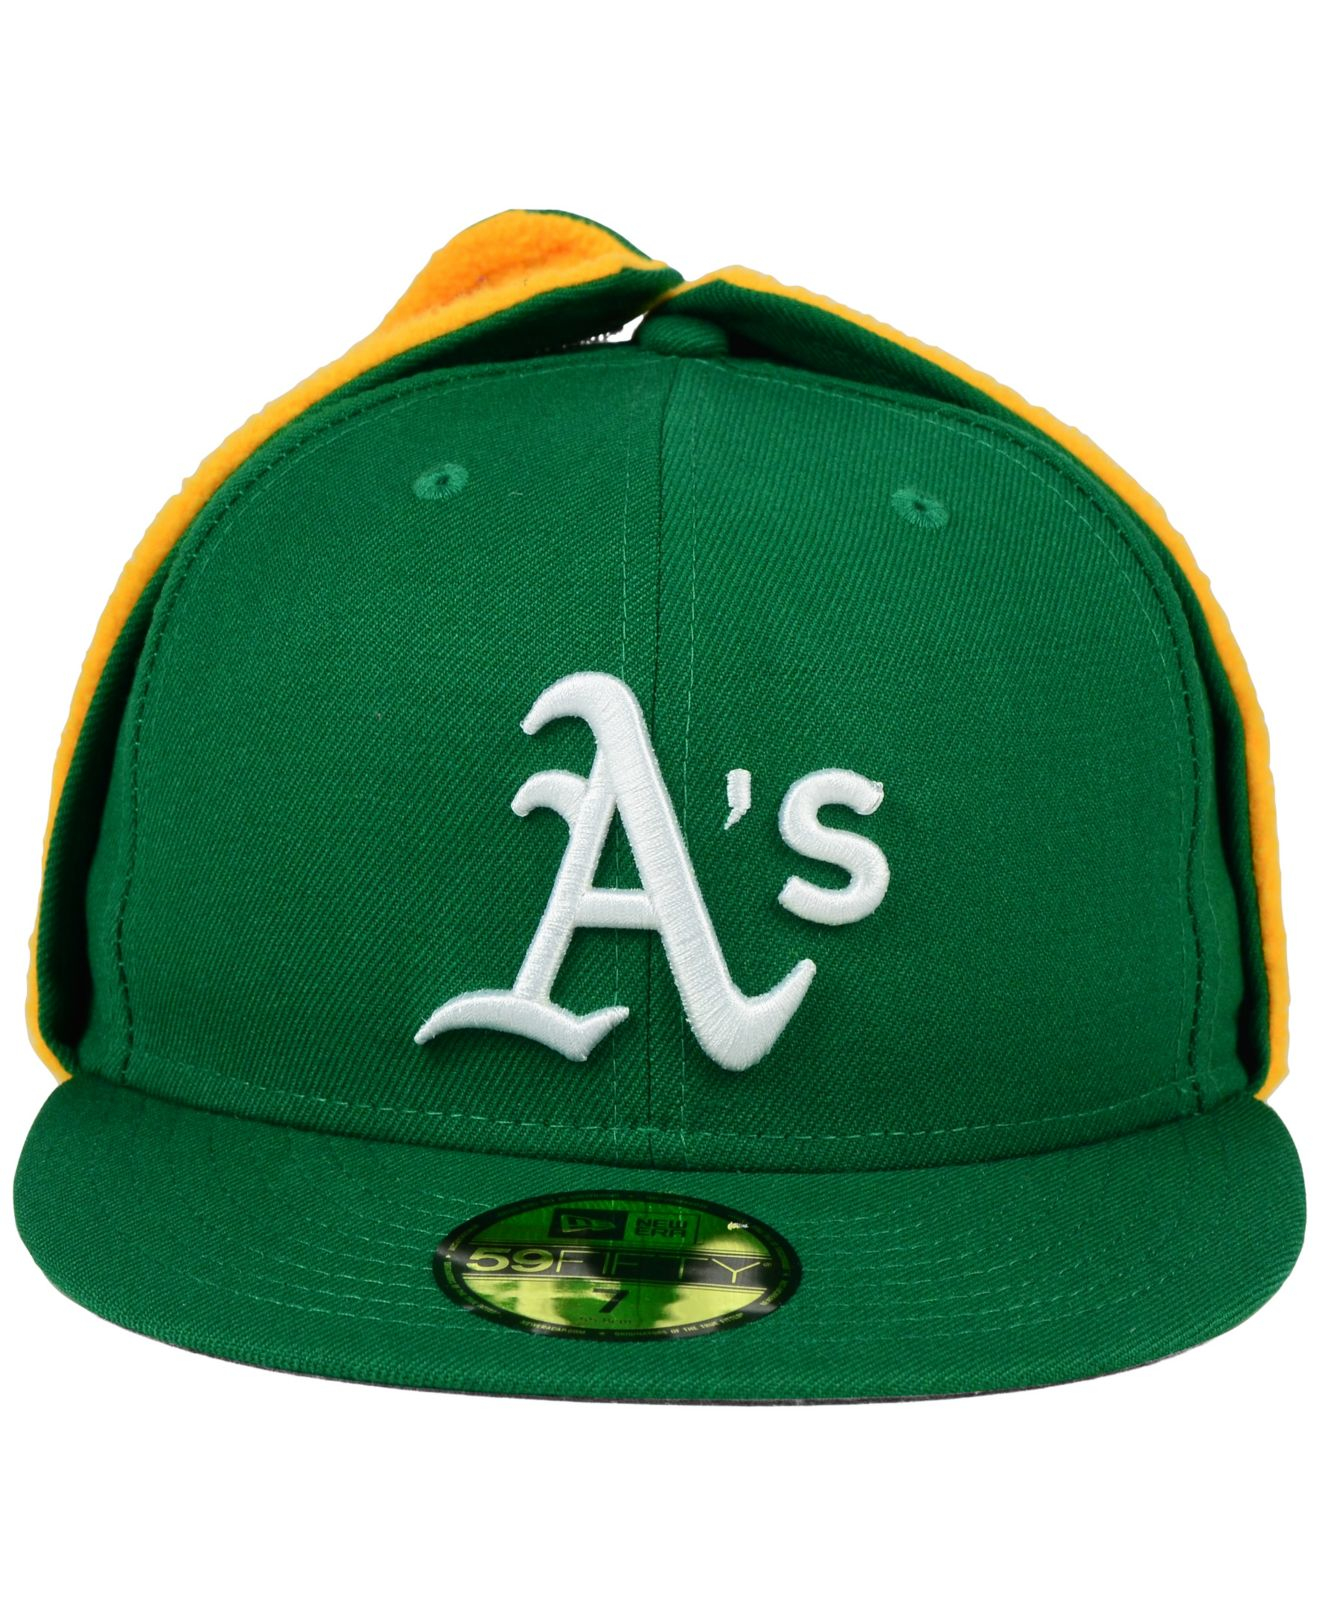 Lyst - KTZ Oakland Athletics Dog Ear 59fifty Cap in Green for Men 1ba2f10f0